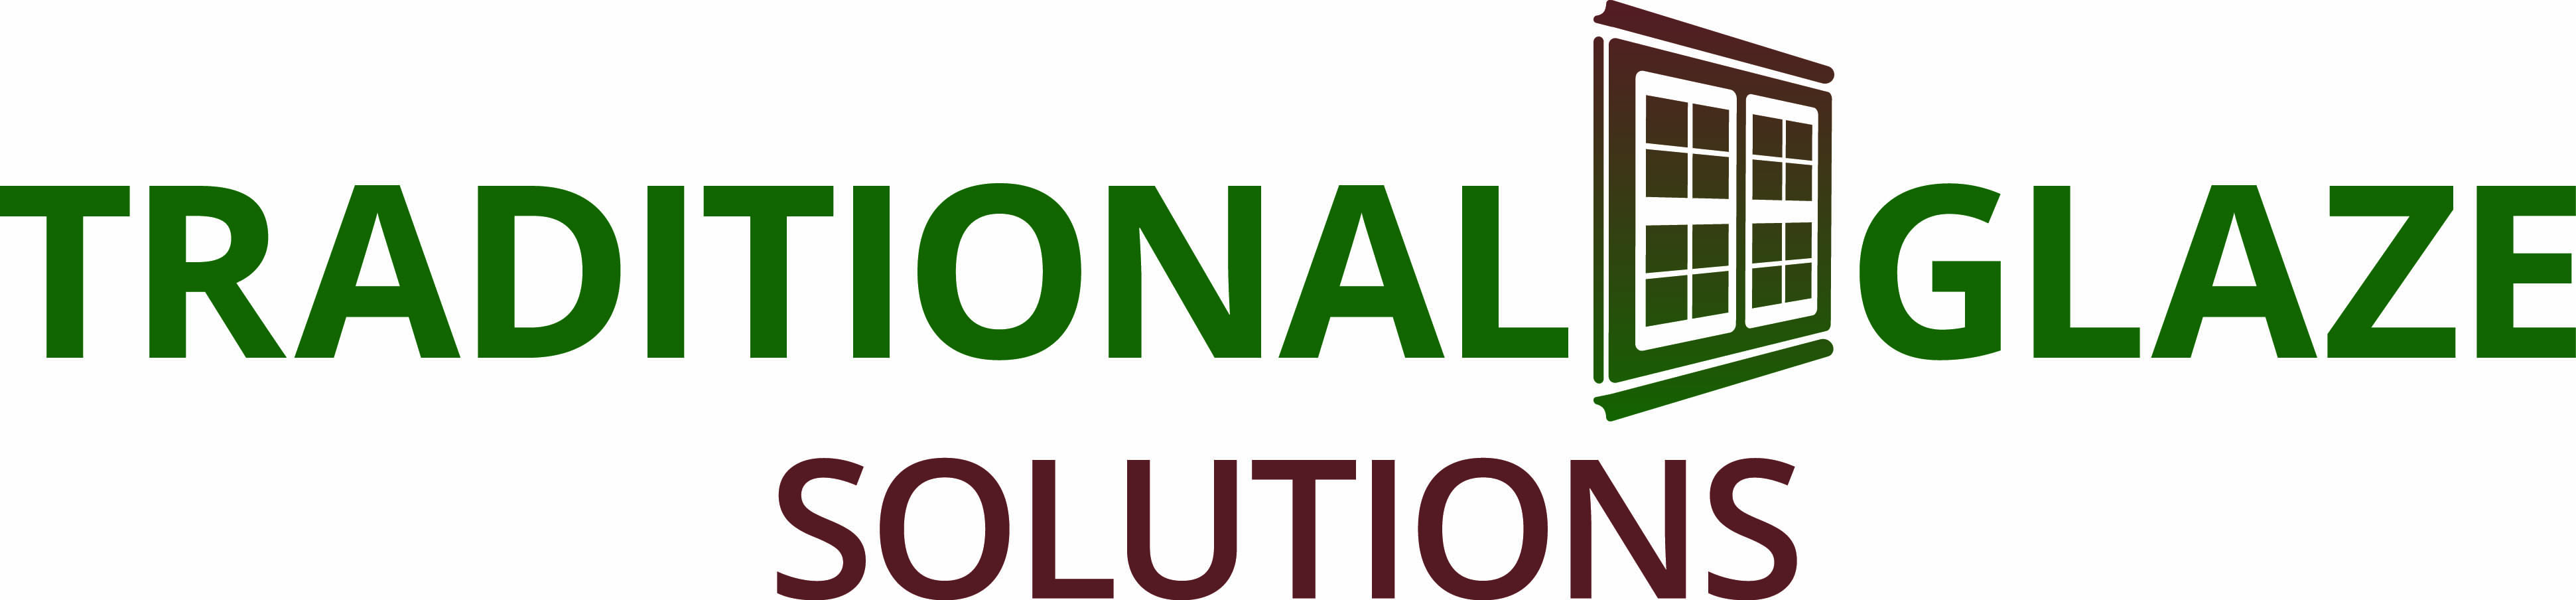 Traditional Glaze Solutions logo